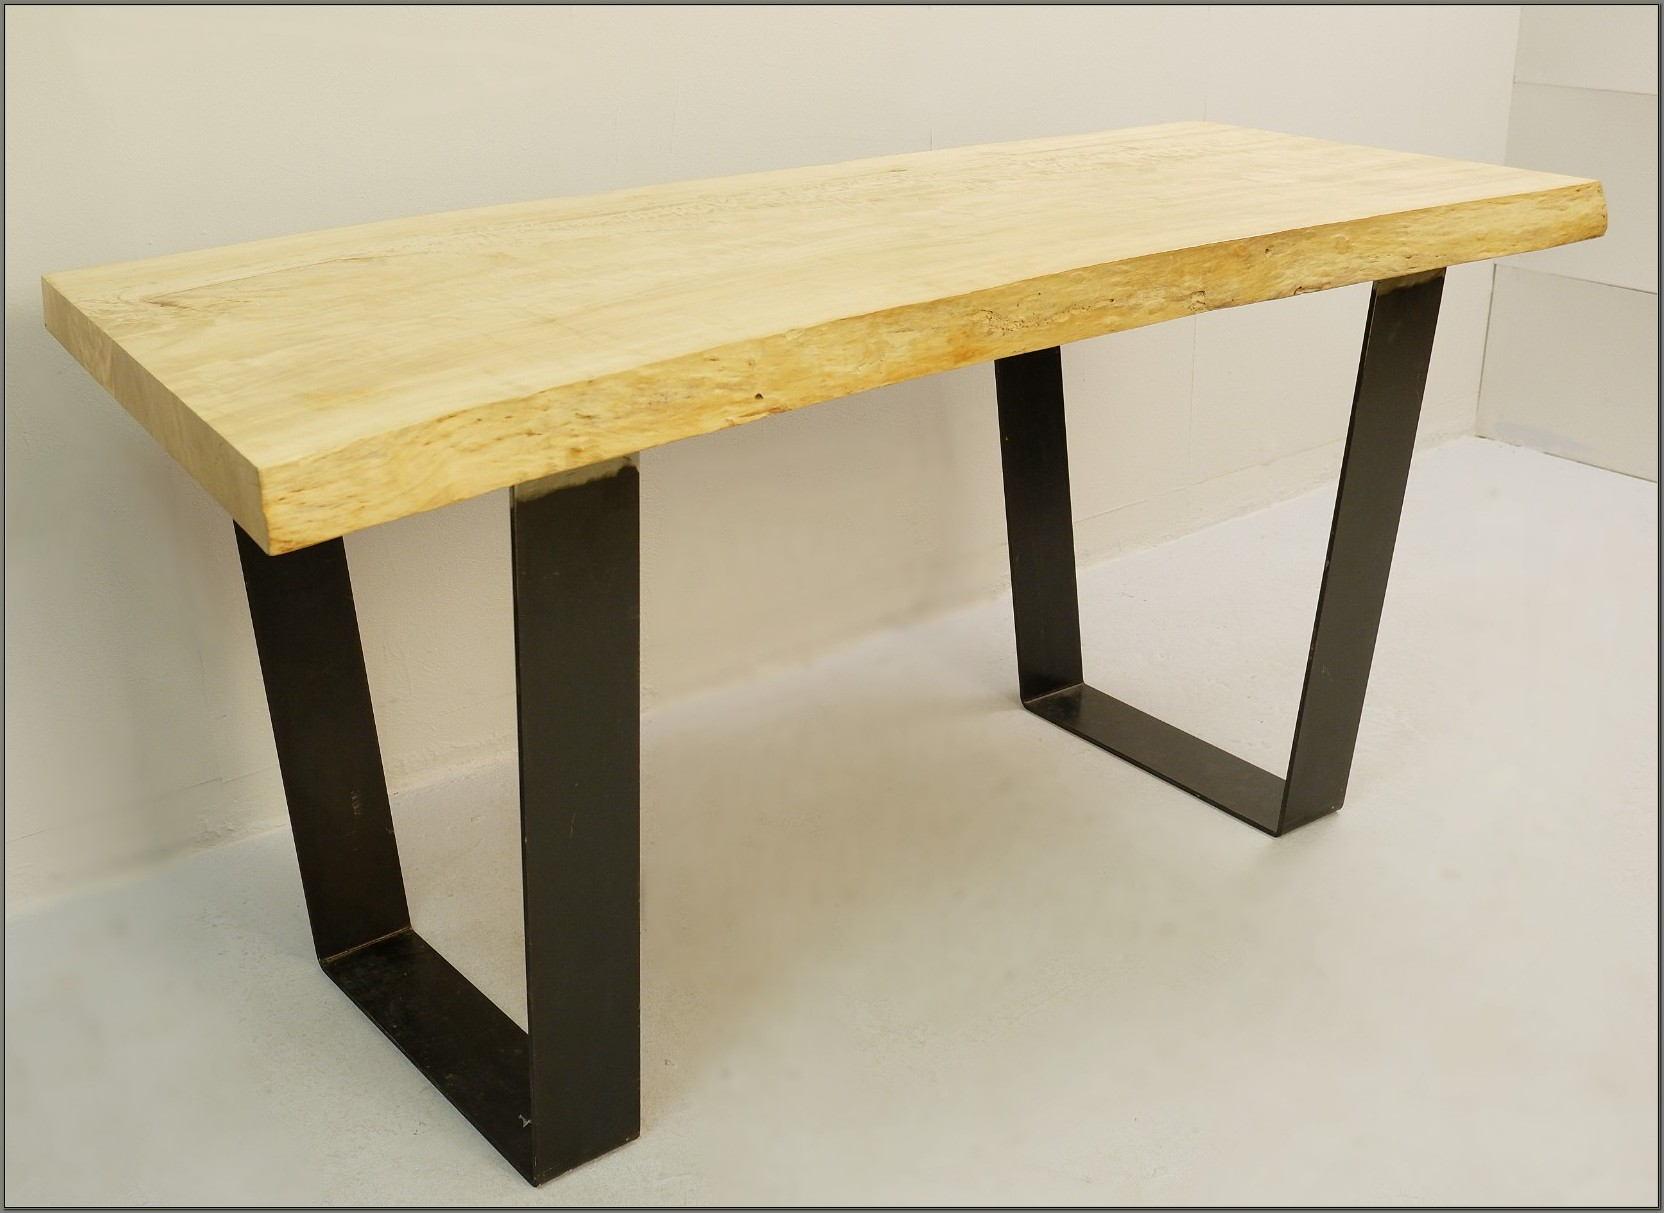 Wood Top Desk With Metal Legs